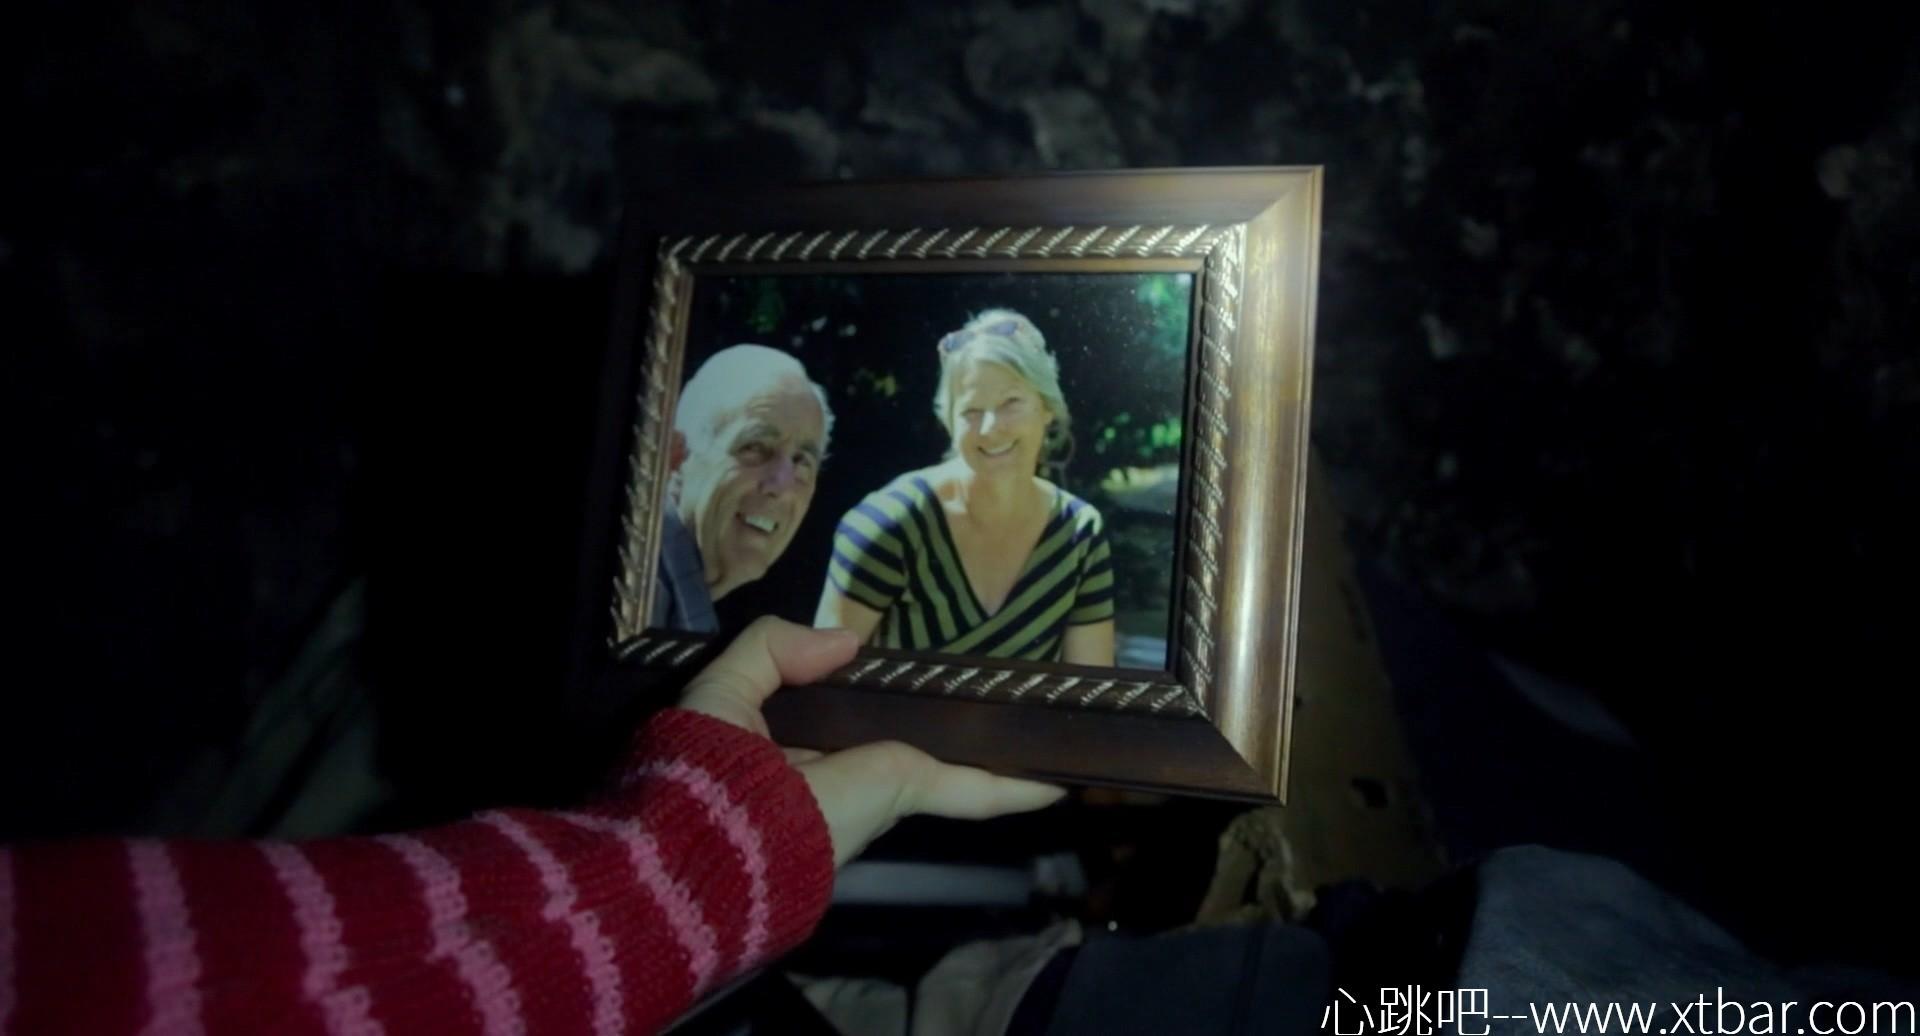 0085j6oIly1gjjcynpu4tj31hc0ssdk6 - [心跳吧周末恐怖片推荐]:《探访惊魂》,令人震惊的老奶奶!